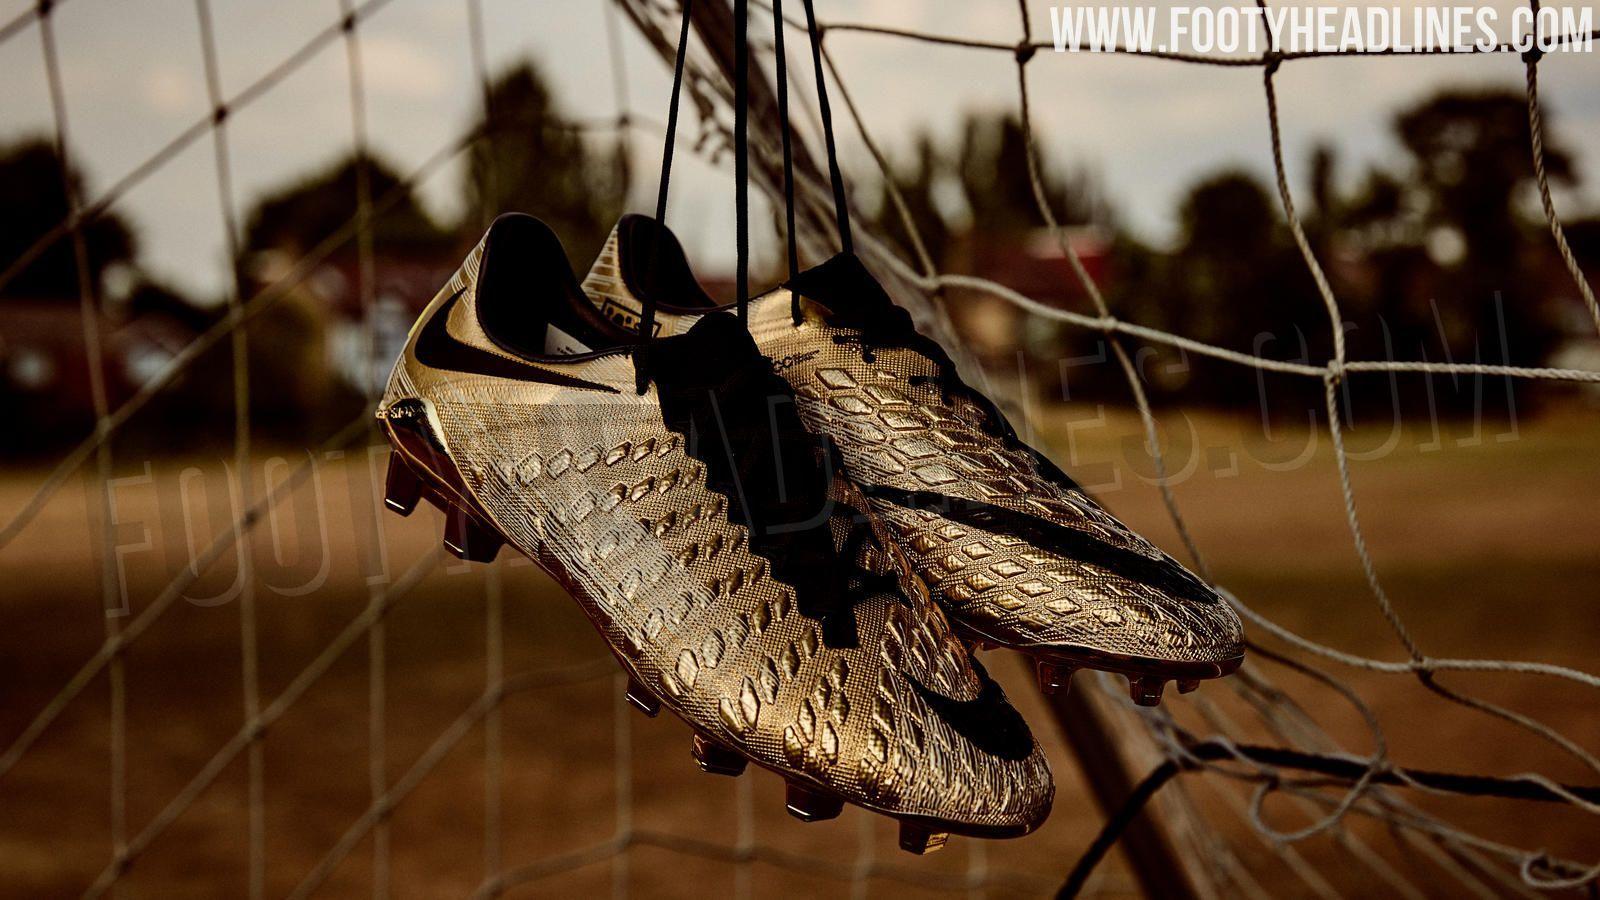 6dc7e5236 Gold Nike Hypervenom Harry Kane Boots Revealed - Footy Headlines ...